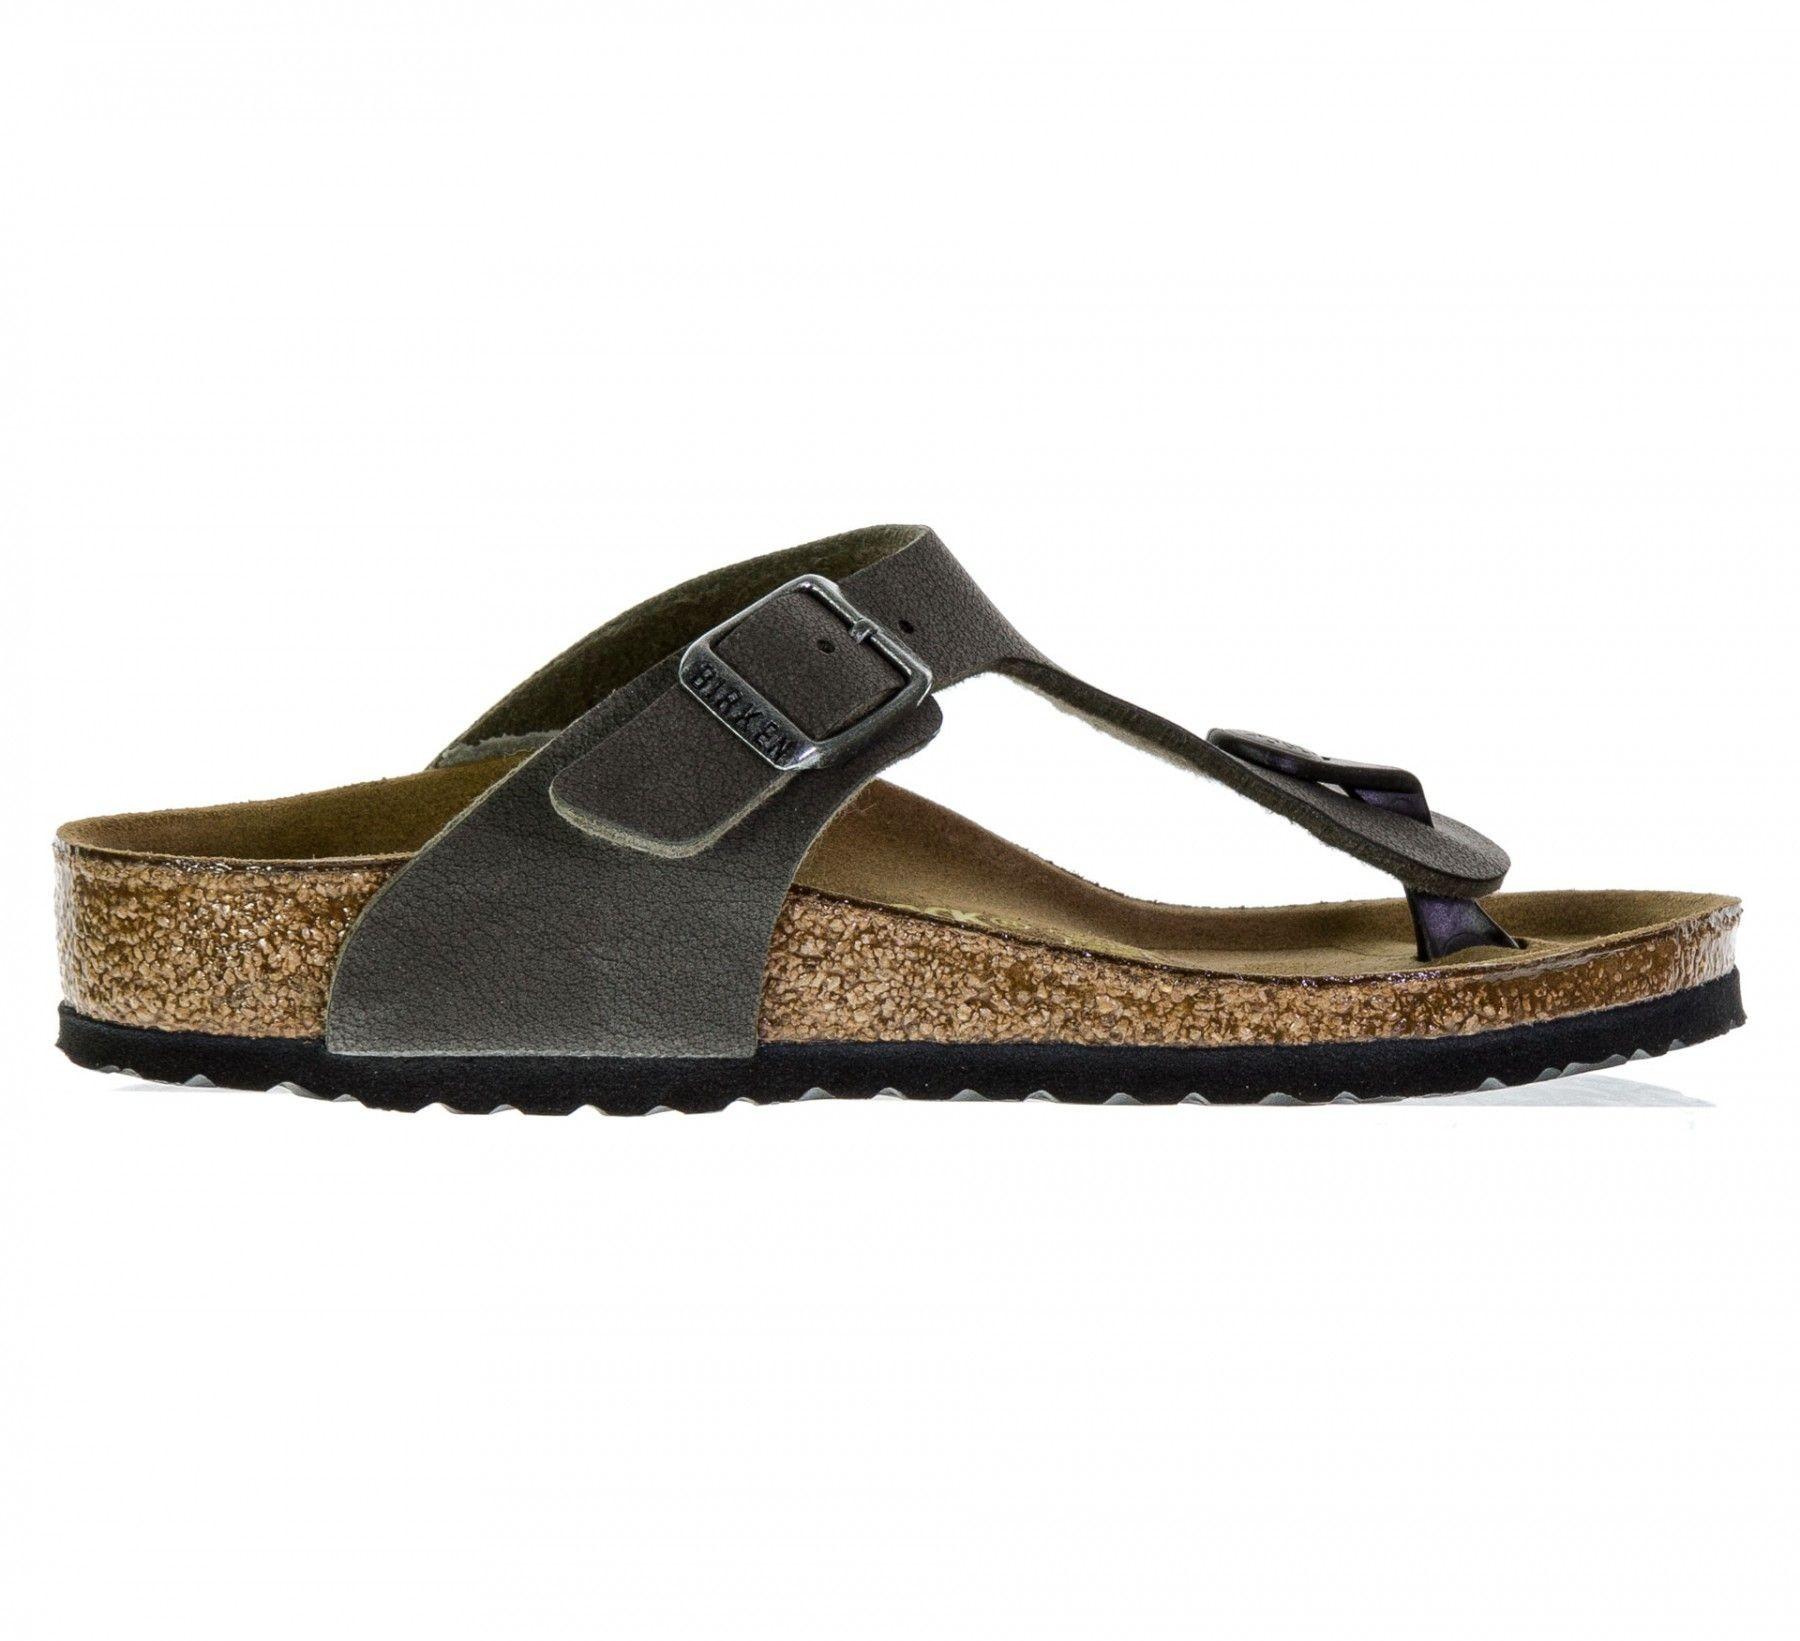 new product 92bb2 52075 Coffee Birkenstock Piazza New York Berkshire Shoes | Portal ...